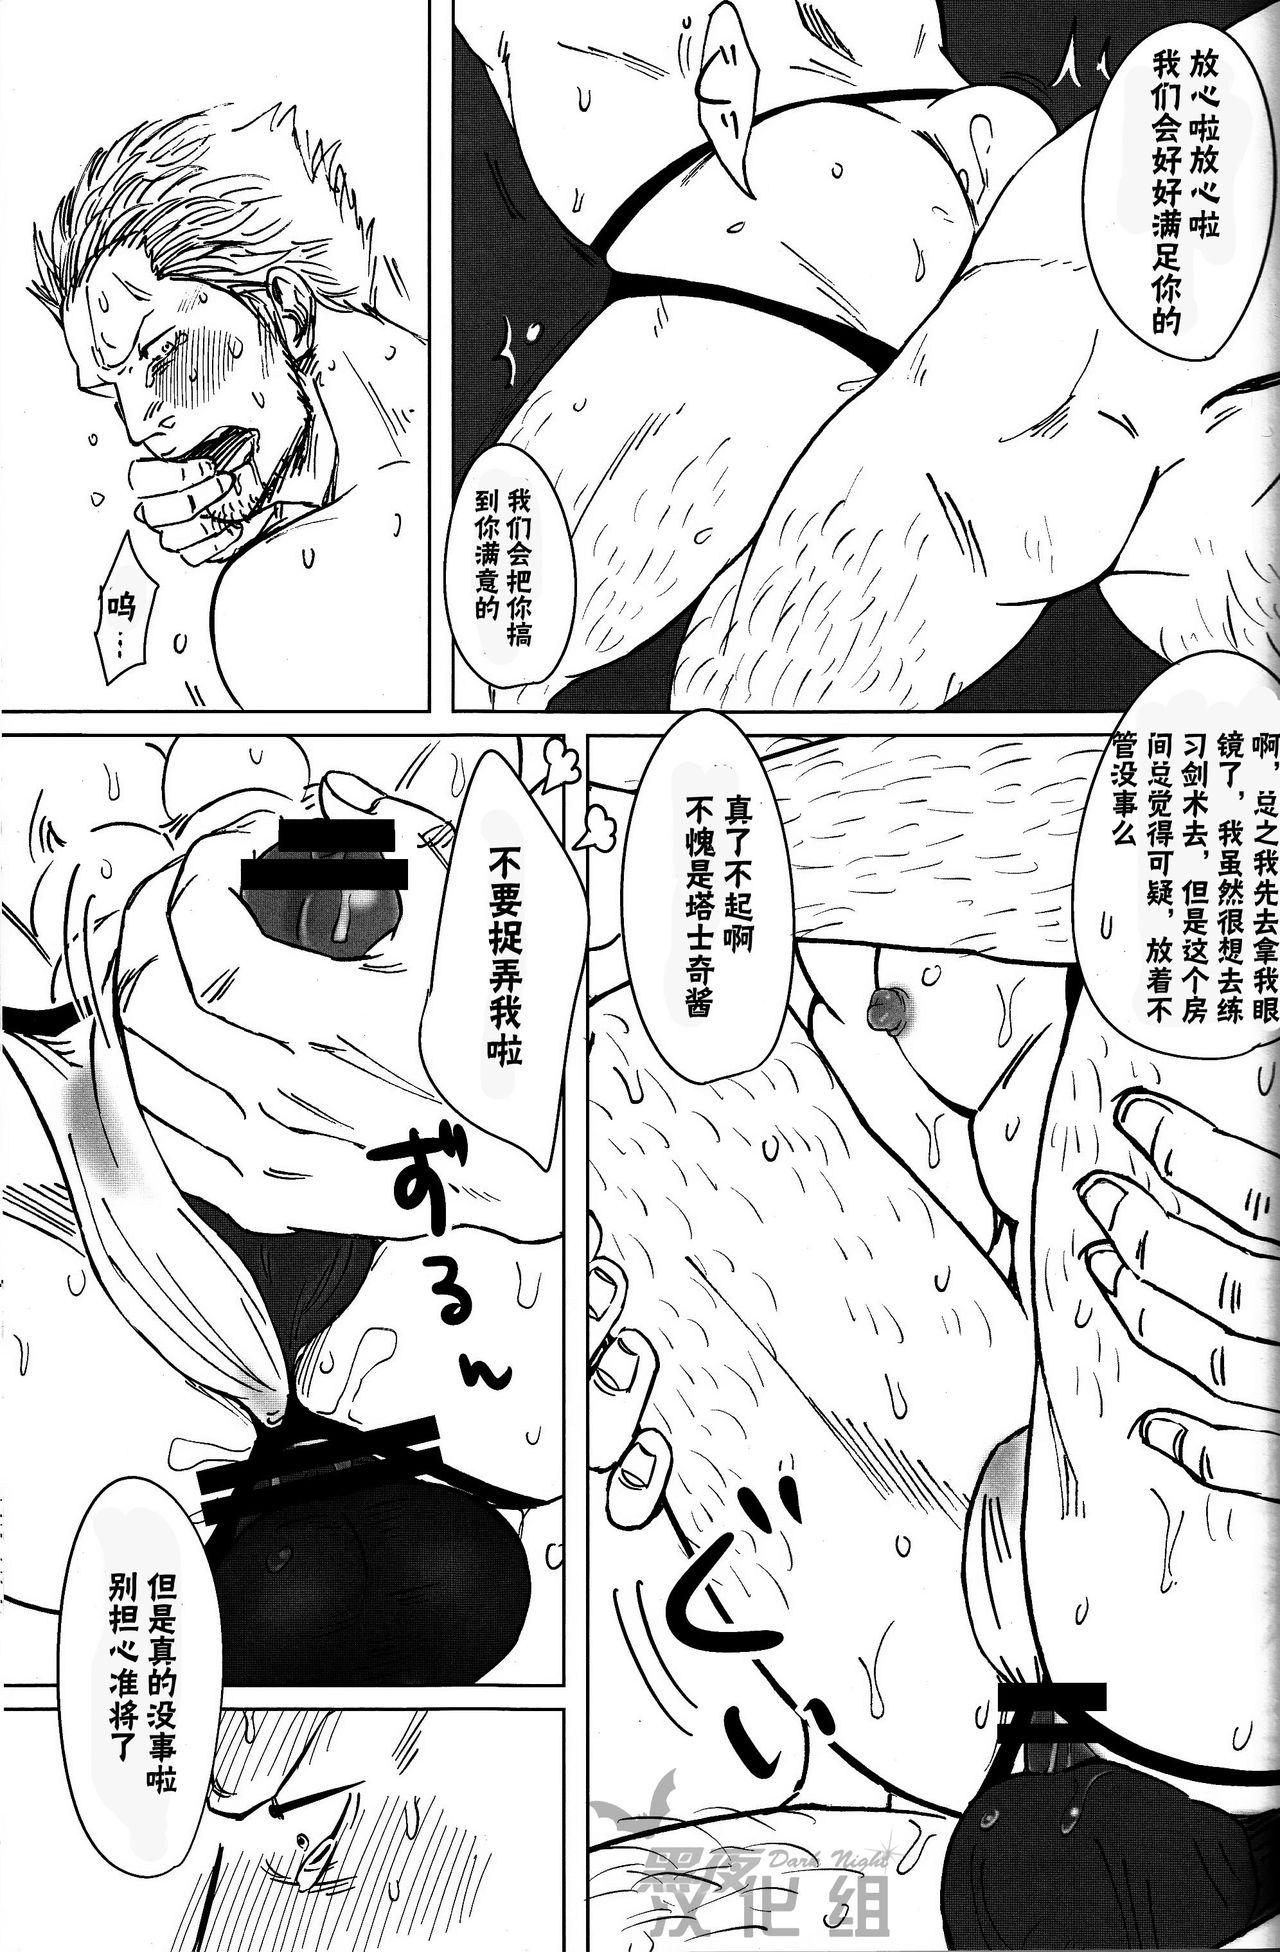 (C82) [Chikuwamome (Ishikawa)] Kemuri Rinkan ~Sin G-5~ | 煙輪x~真G5~ (One Piece) [Chinese] [黑夜汉化组] 7